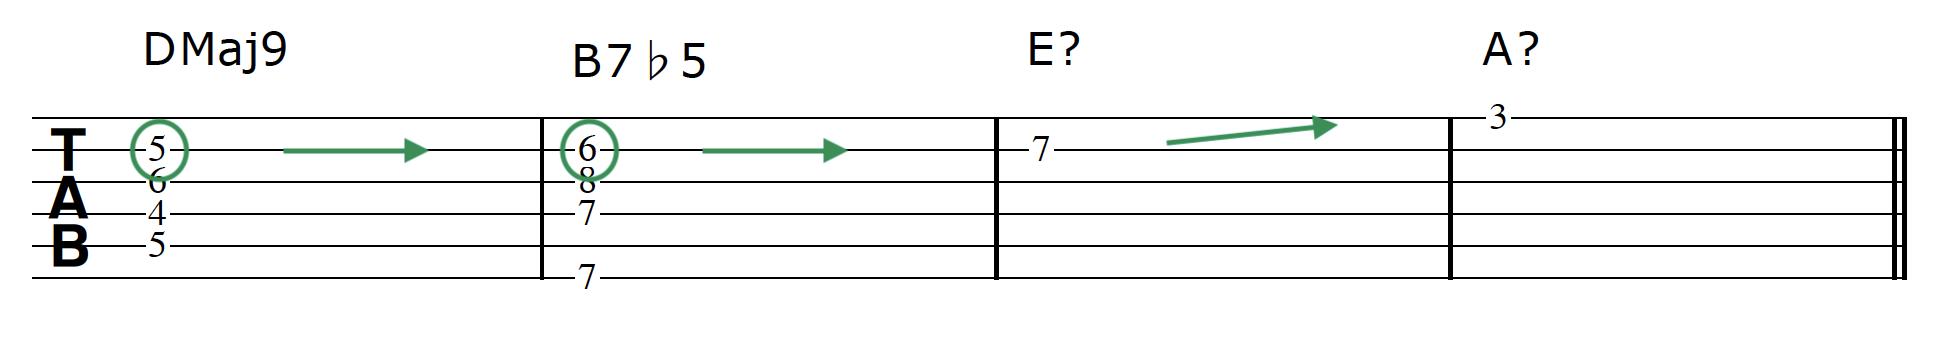 Advanced Guitar Chords Progression 1 Chord 2